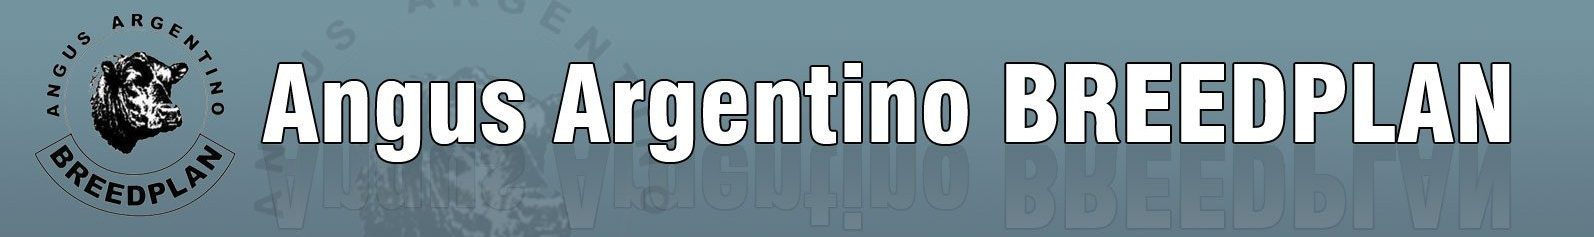 Angus Argentino BREEDPLAN